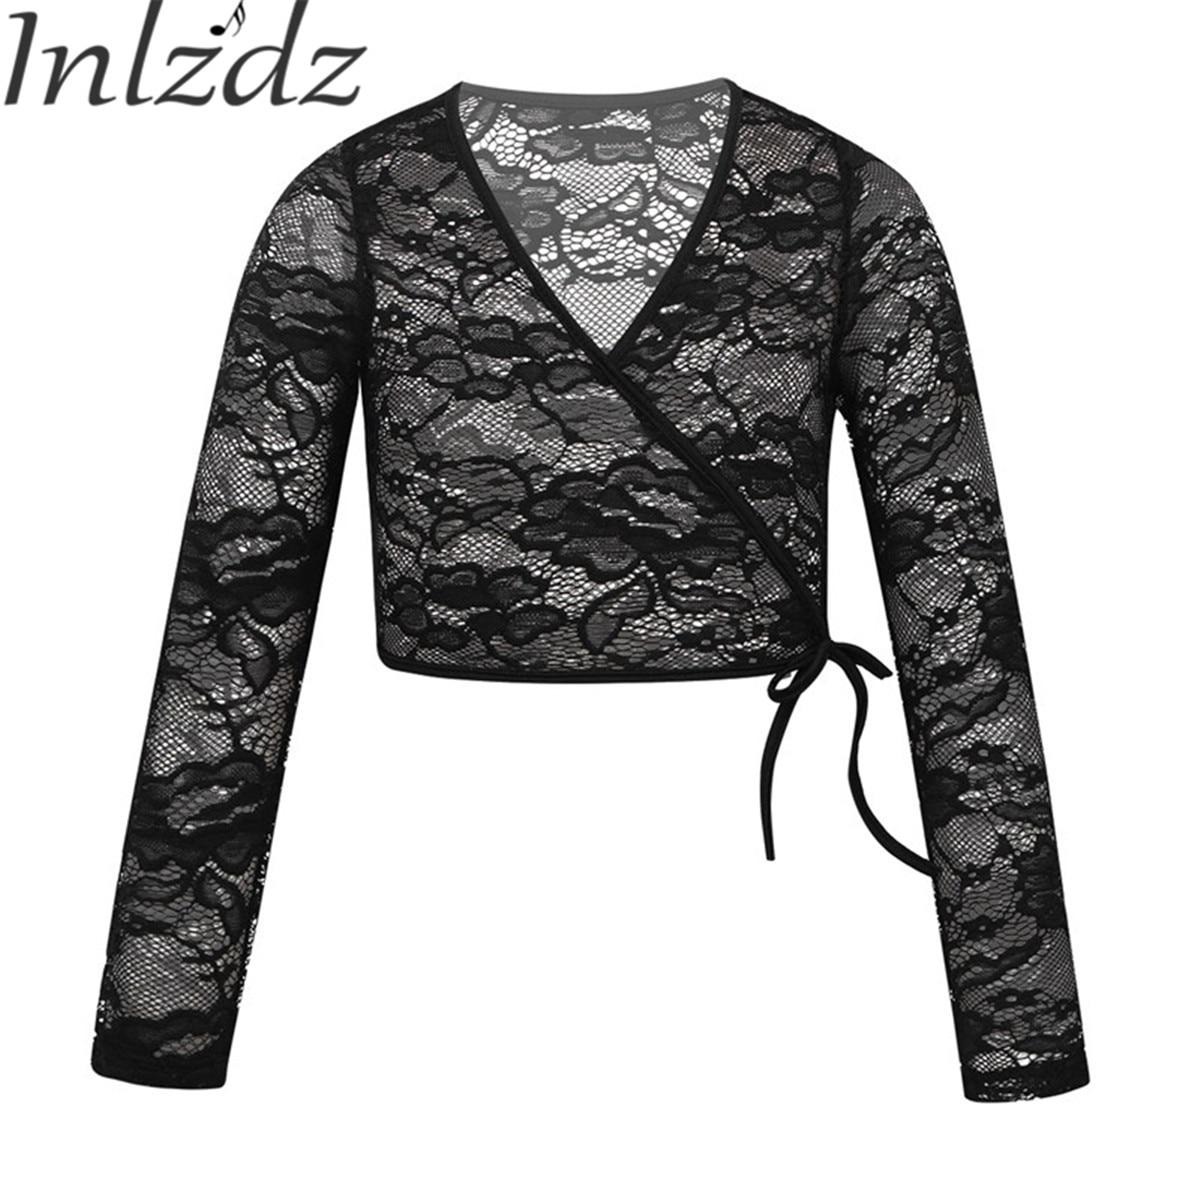 Kids Girls Ballet Sweater Dance Costome Floral Wrap Top Ballerina Tutu Dancewear Jacket Gymnastics Leotard Child Dance Clothing